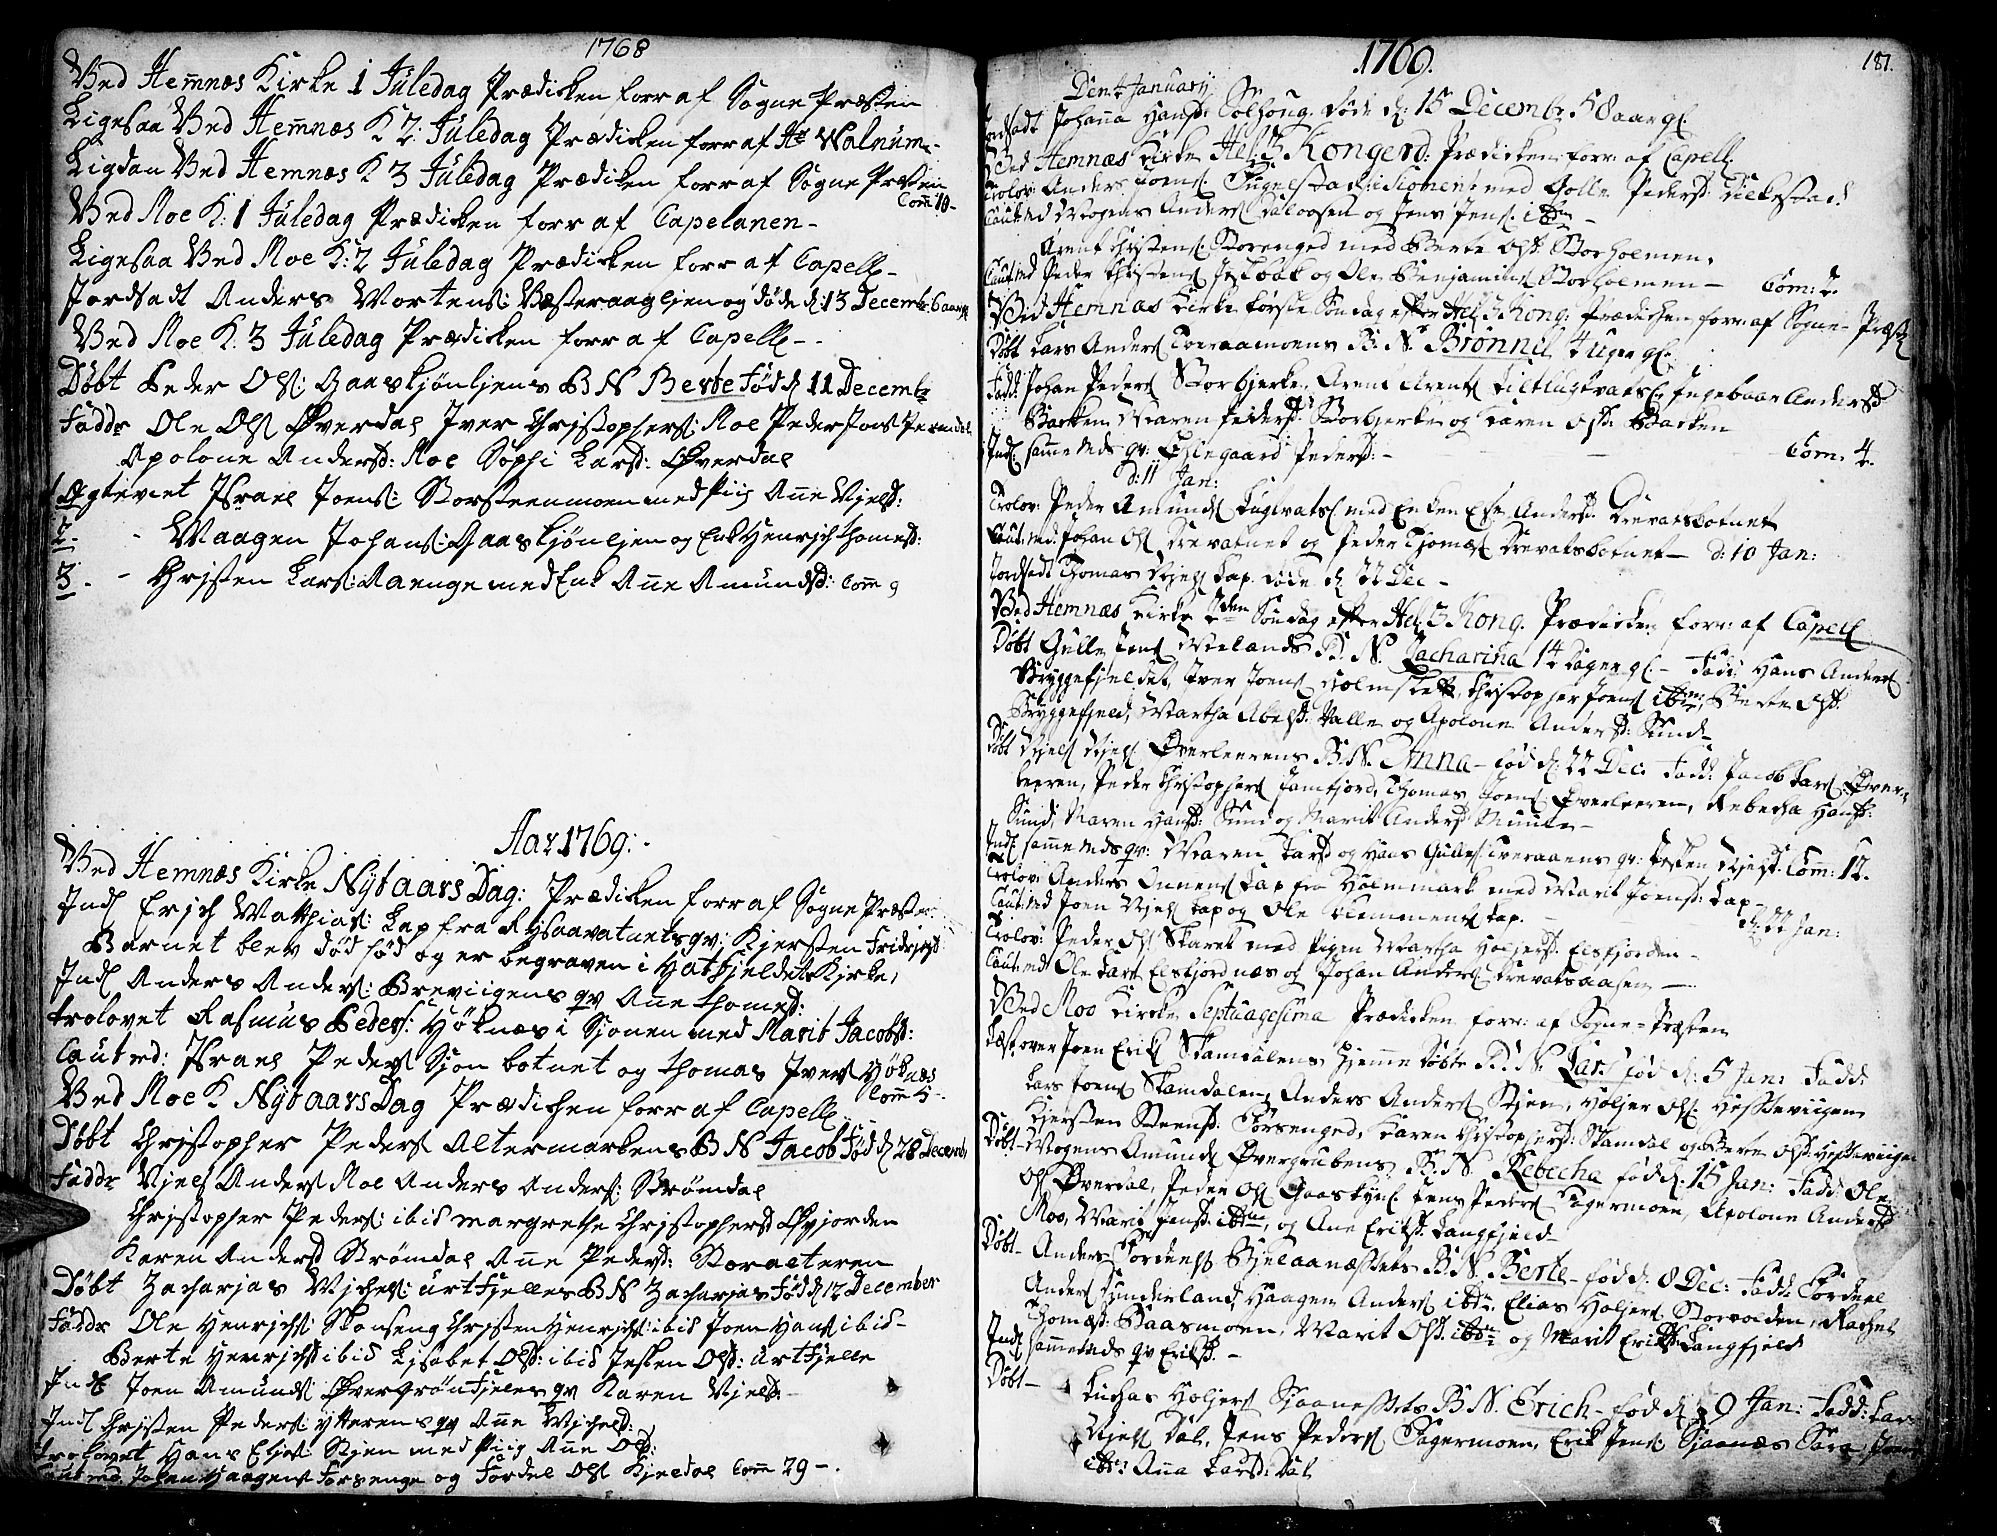 SAT, Ministerialprotokoller, klokkerbøker og fødselsregistre - Nordland, 825/L0348: Ministerialbok nr. 825A04, 1752-1788, s. 181